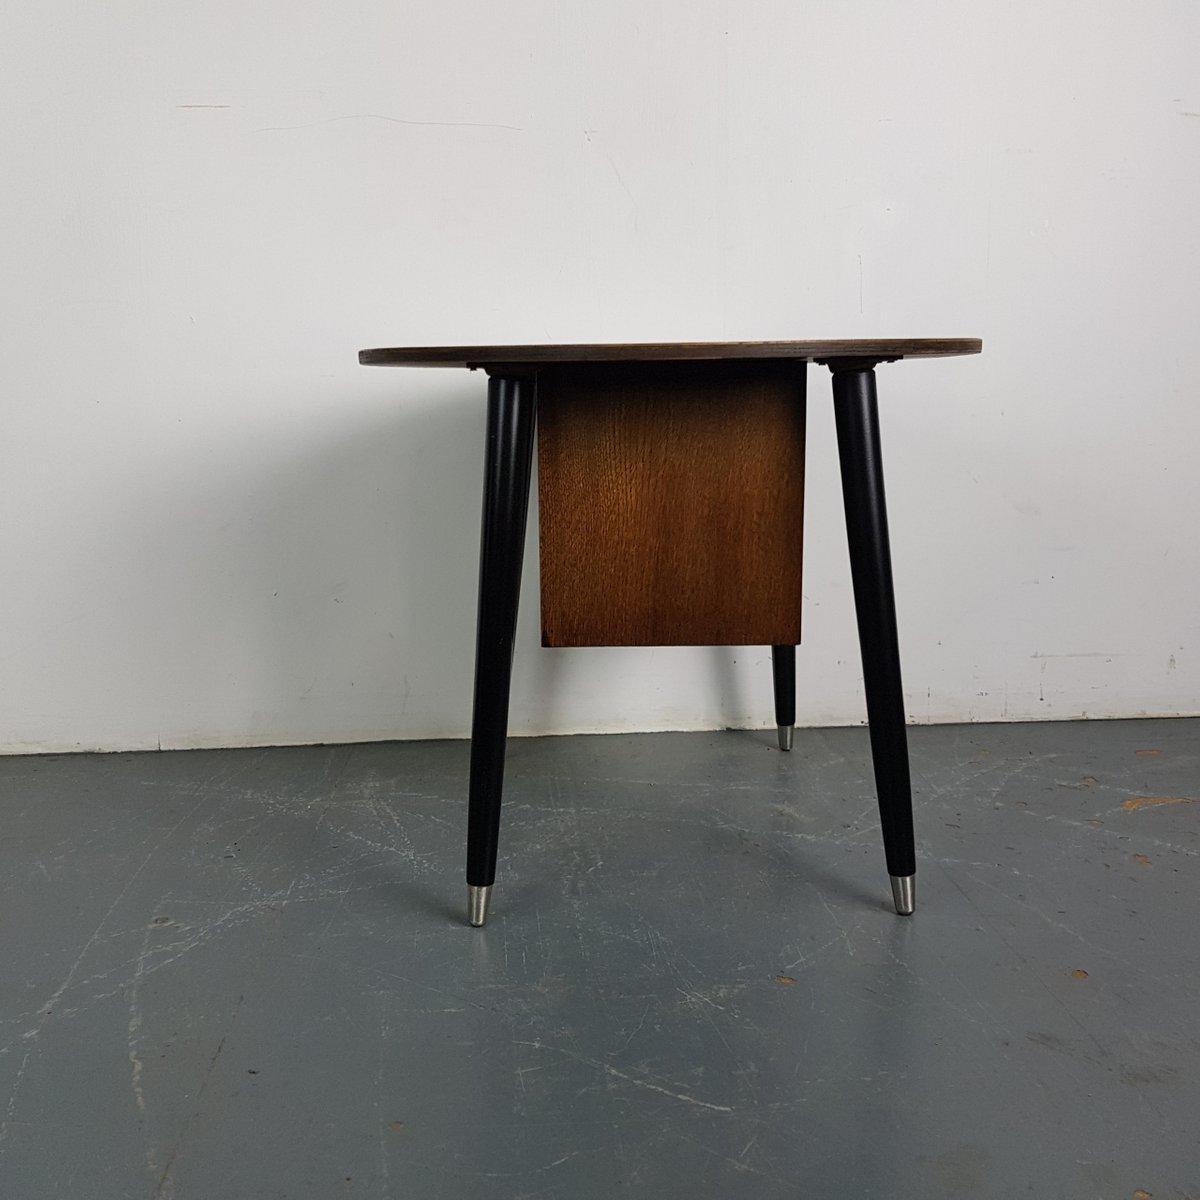 Vintage Dark Wood Coffee Table With Shelf 1950s